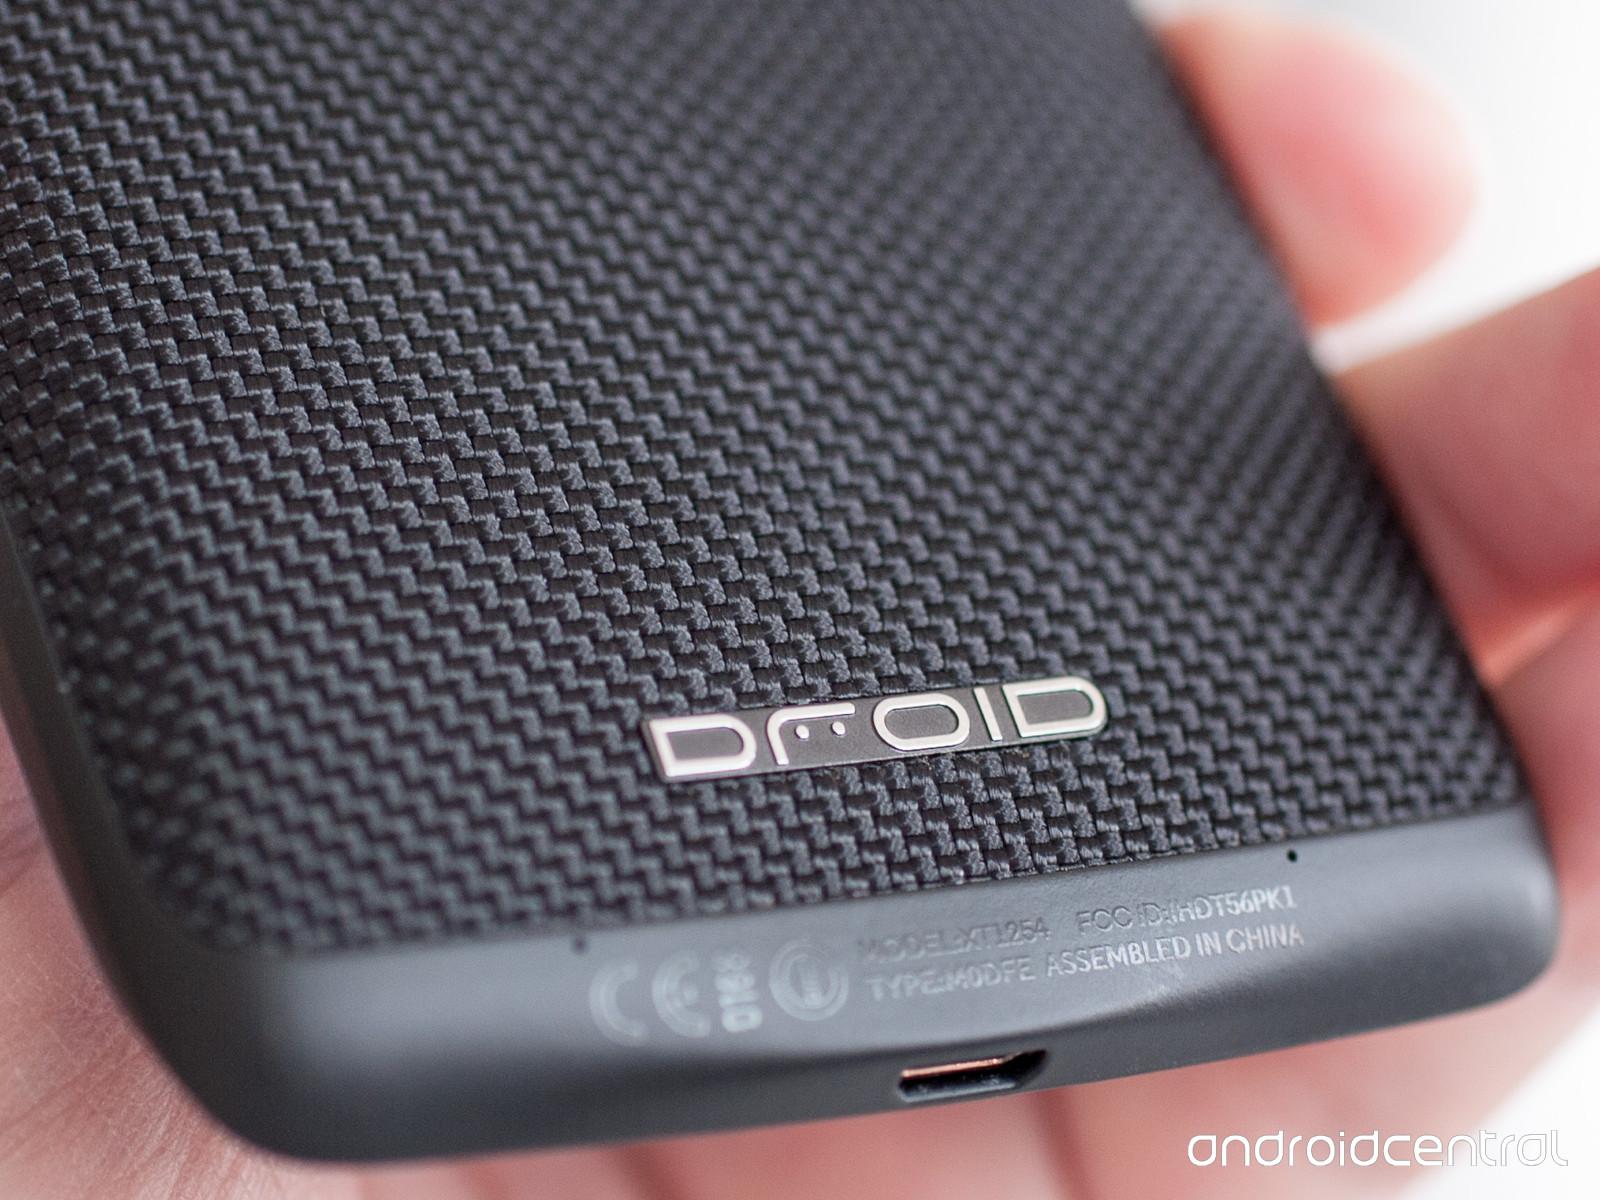 48+] Motorola Droid Turbo Wallpapers on WallpaperSafari